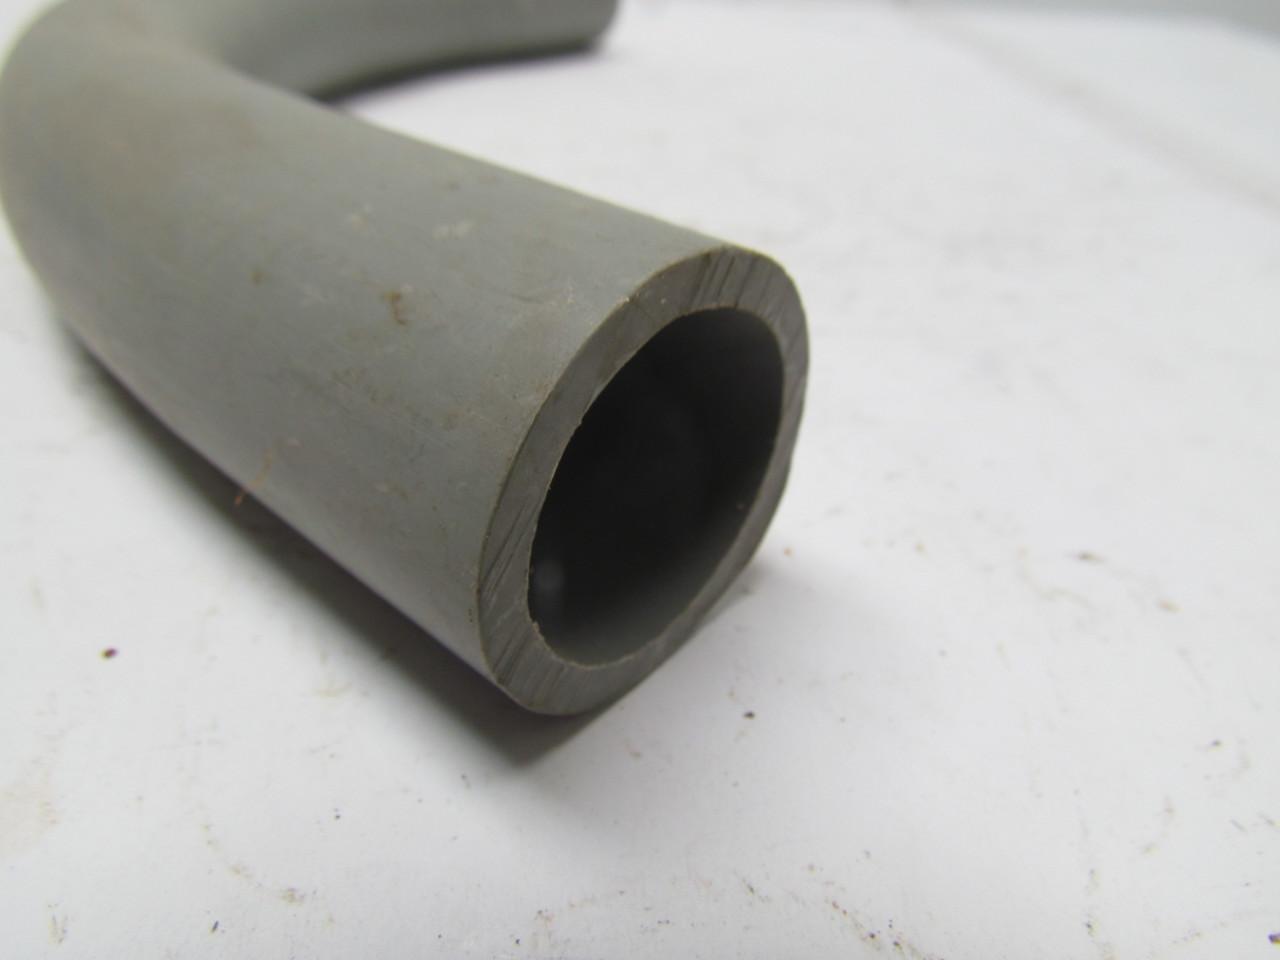 Quot non metallic pvc conduit ° sweep fitting lot of